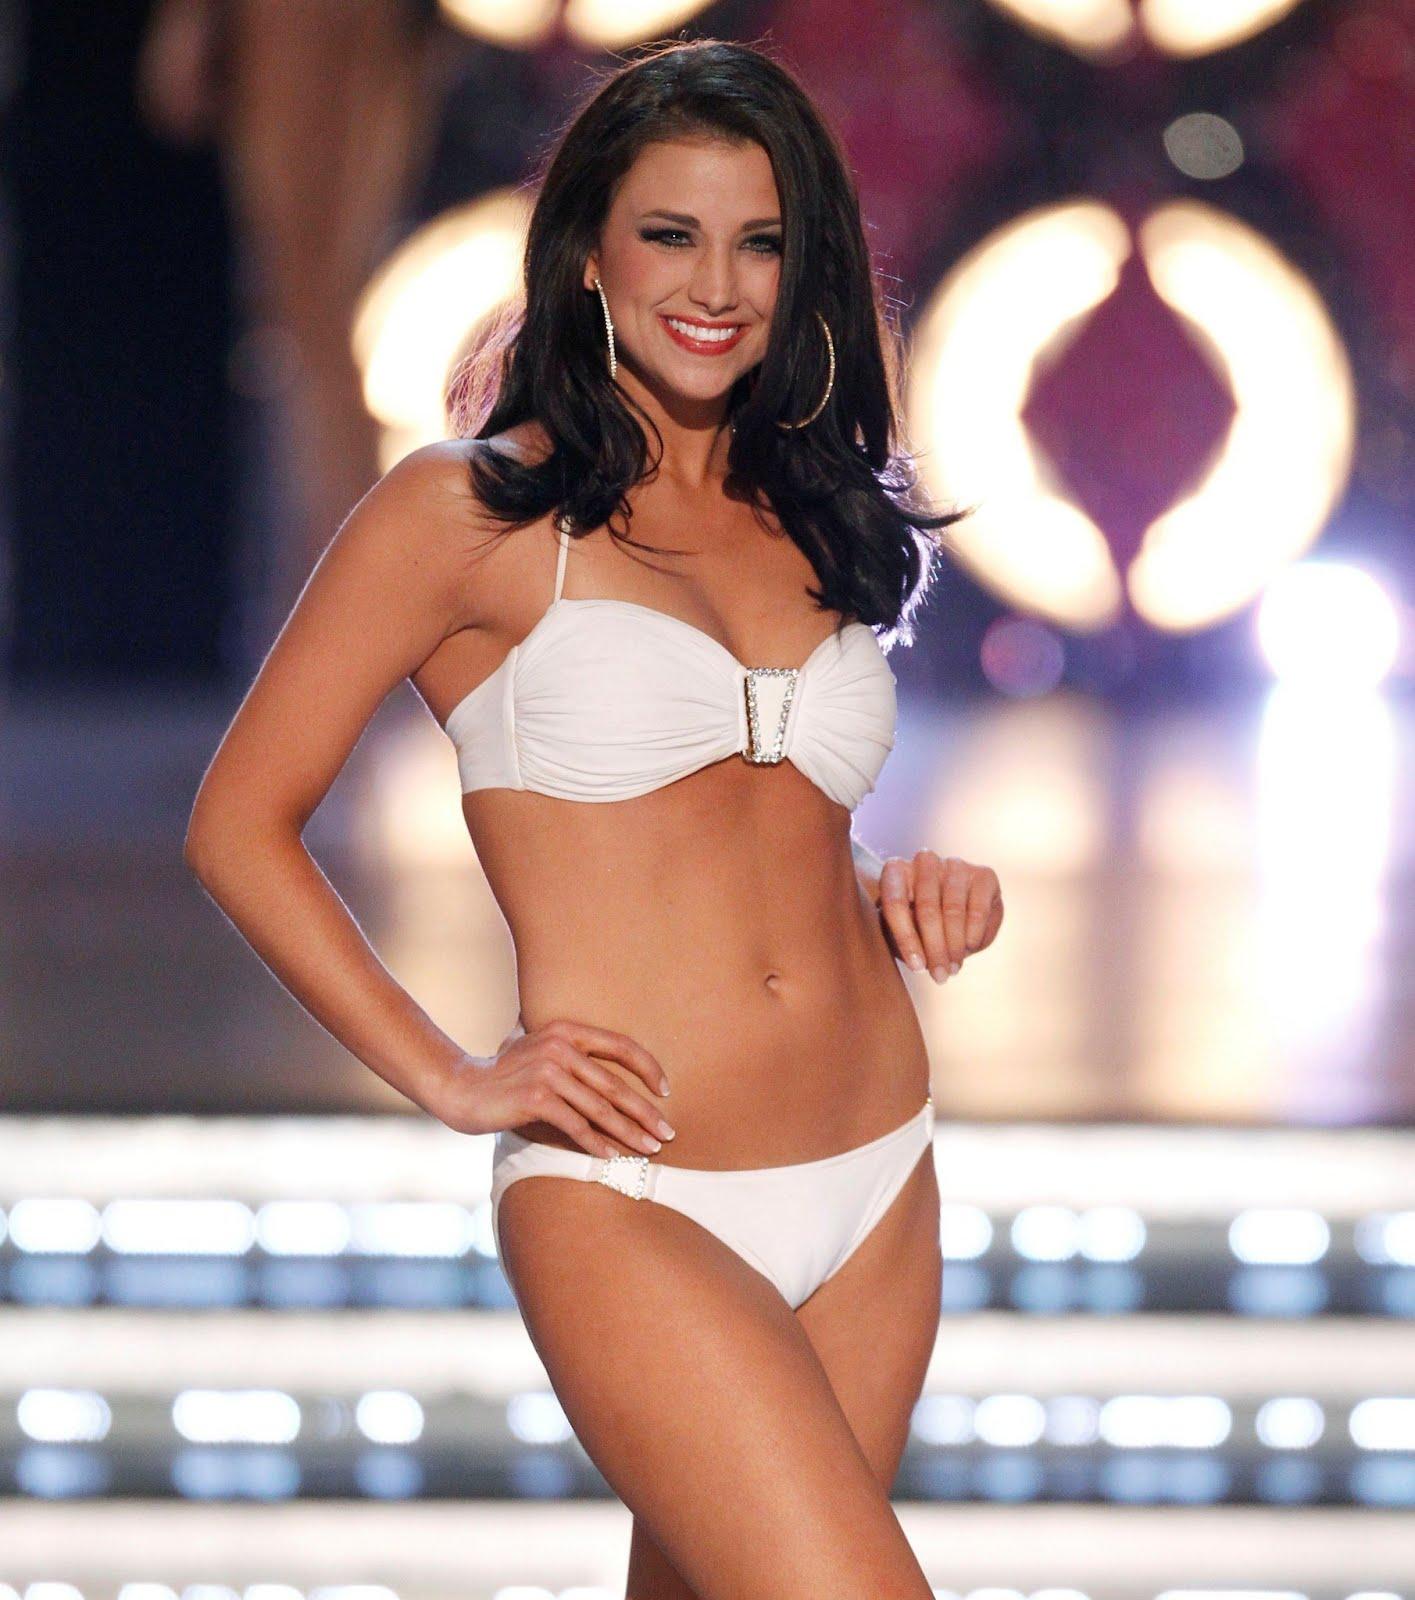 Miss_America_2012_Winner_Laura_Kaeppeler_Wallpapers-bikini